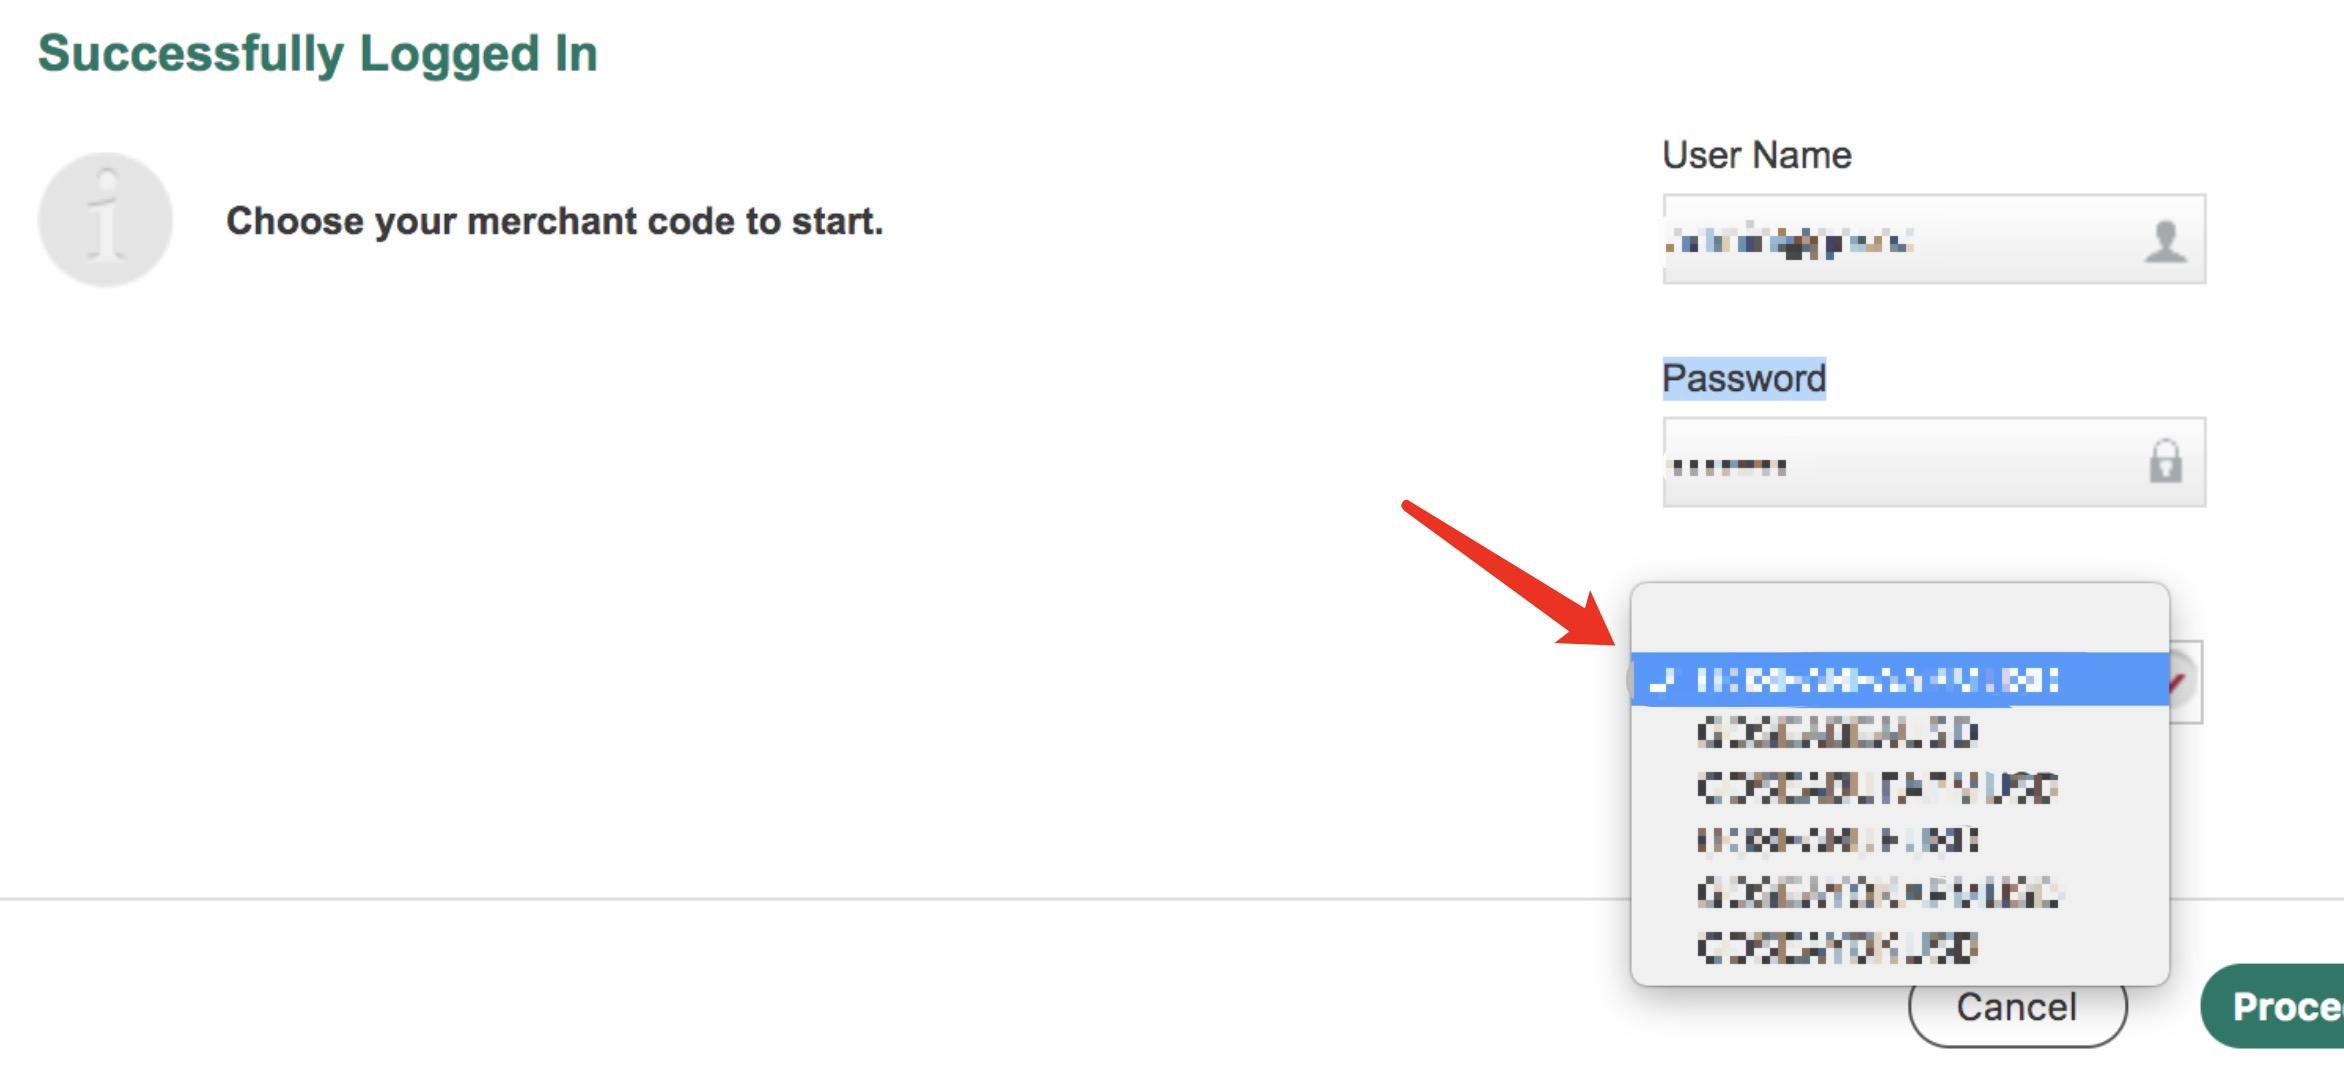 选择Merchant Code